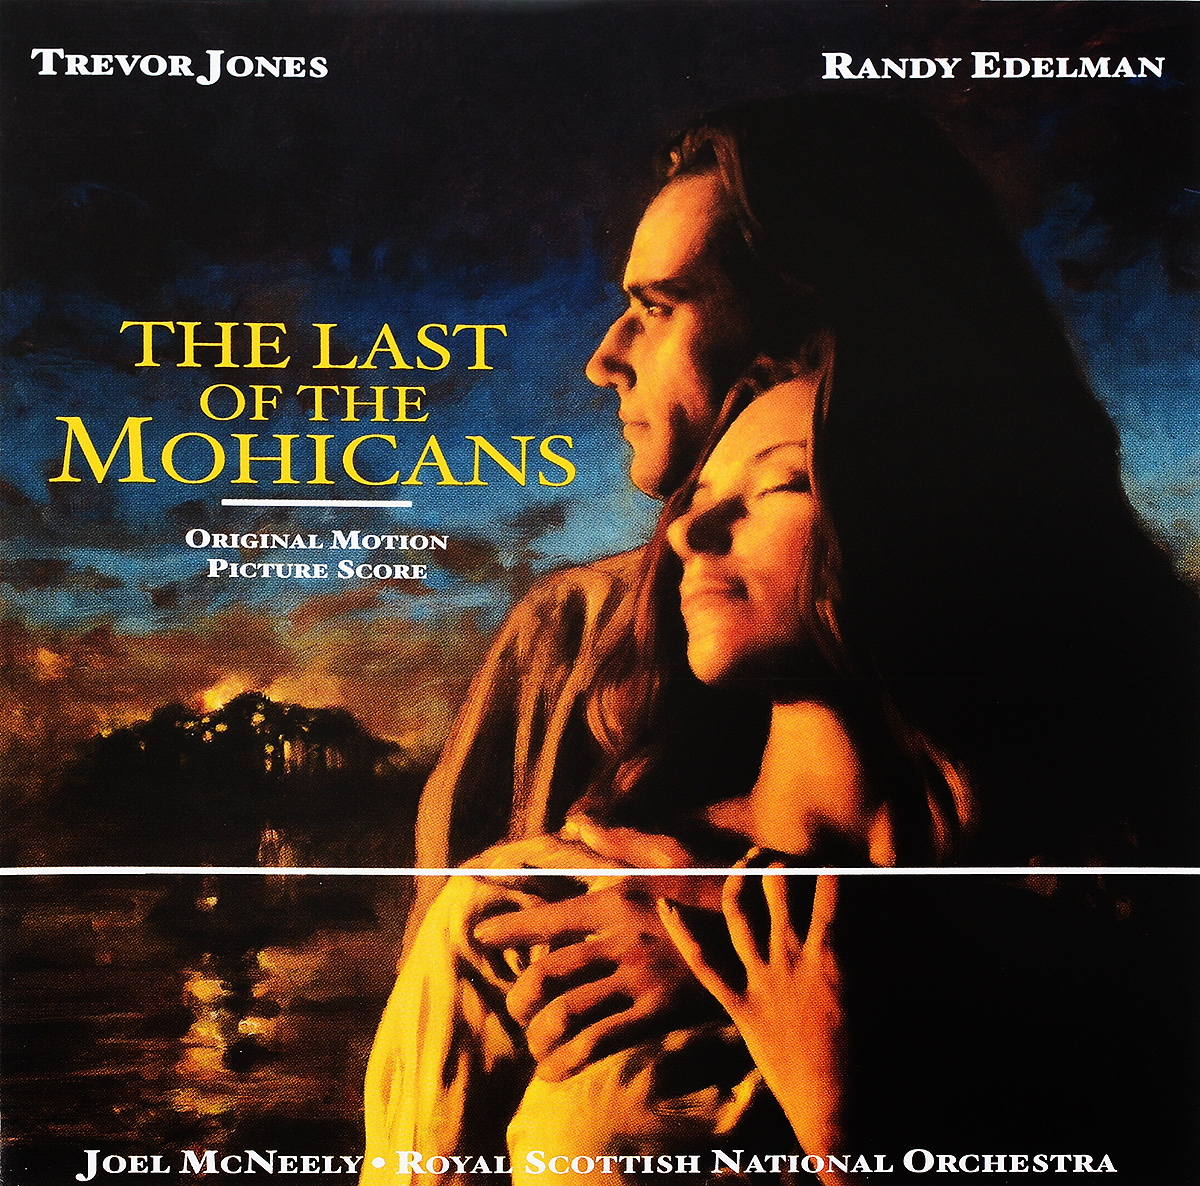 Джоэл Макнили,Royal Scottish National Orchestra Trevor Jones, Randy Edelman. The Last Of The Mohicans: Original Motion Picture Score